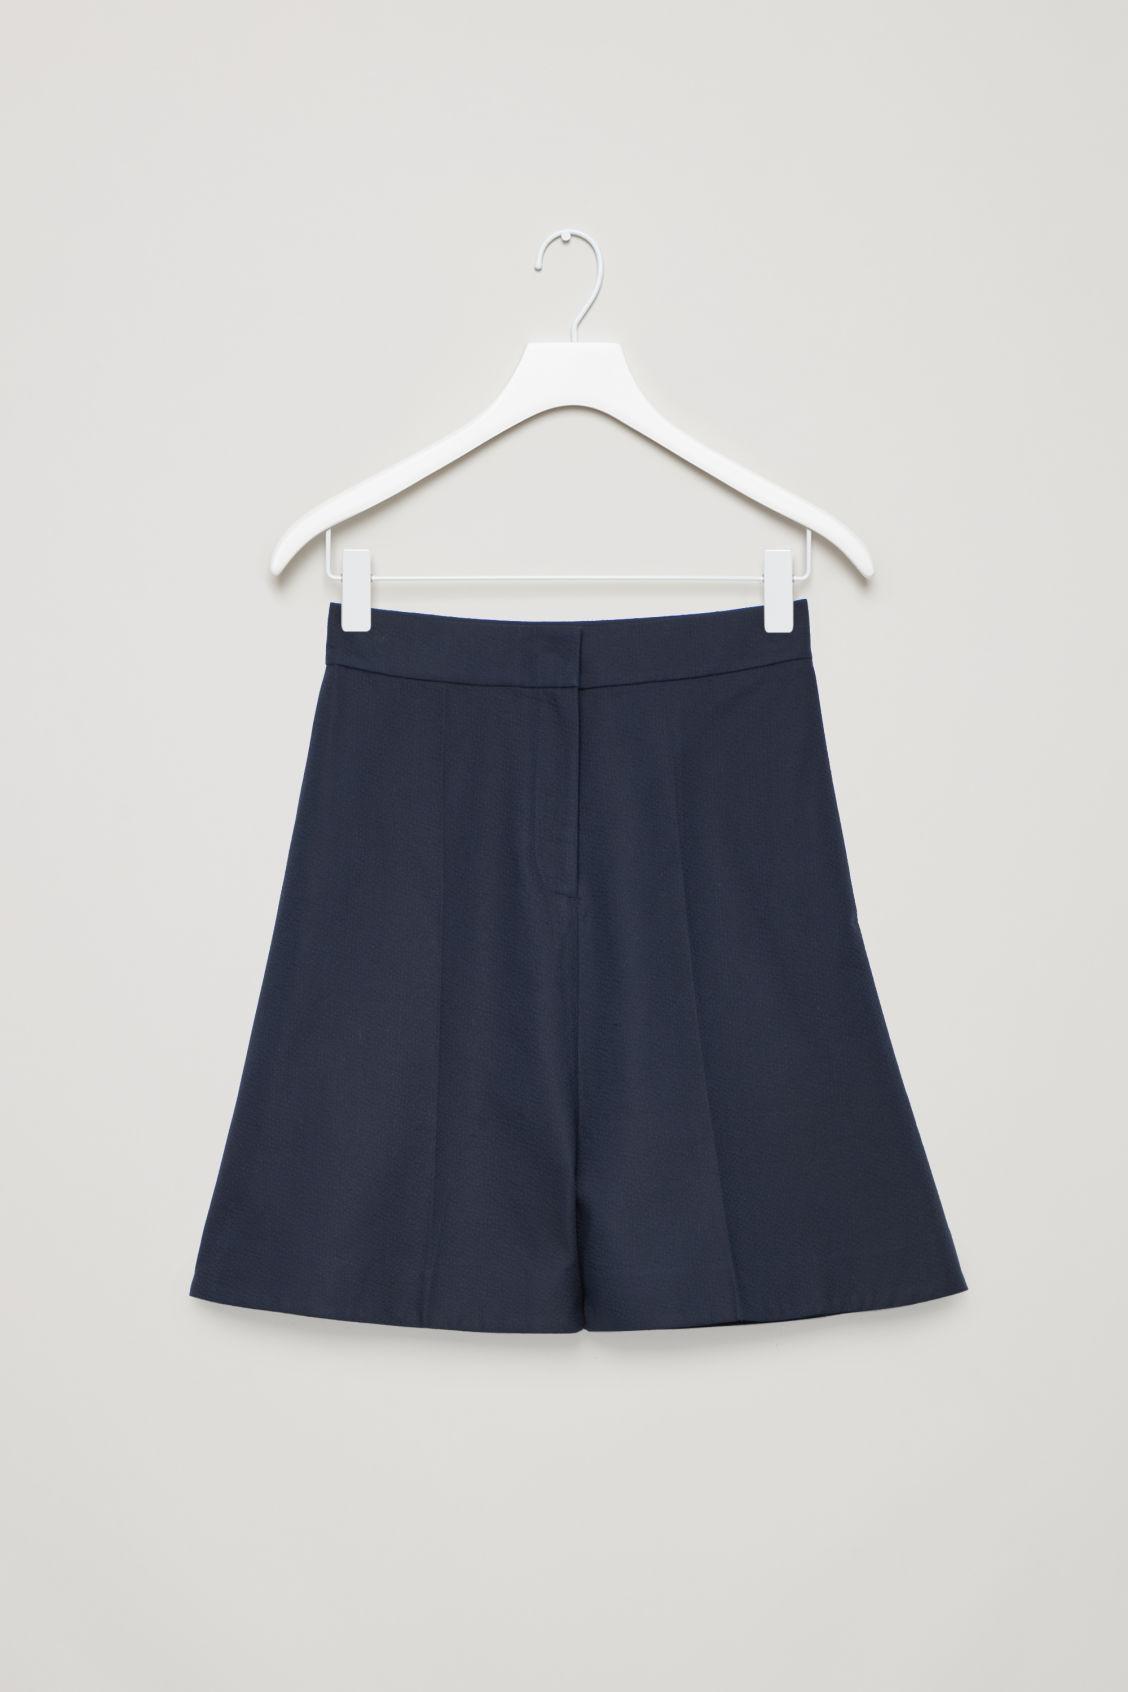 a647460614c8 Buy cos shorts for women - Best women's cos shorts shop - Cools.com